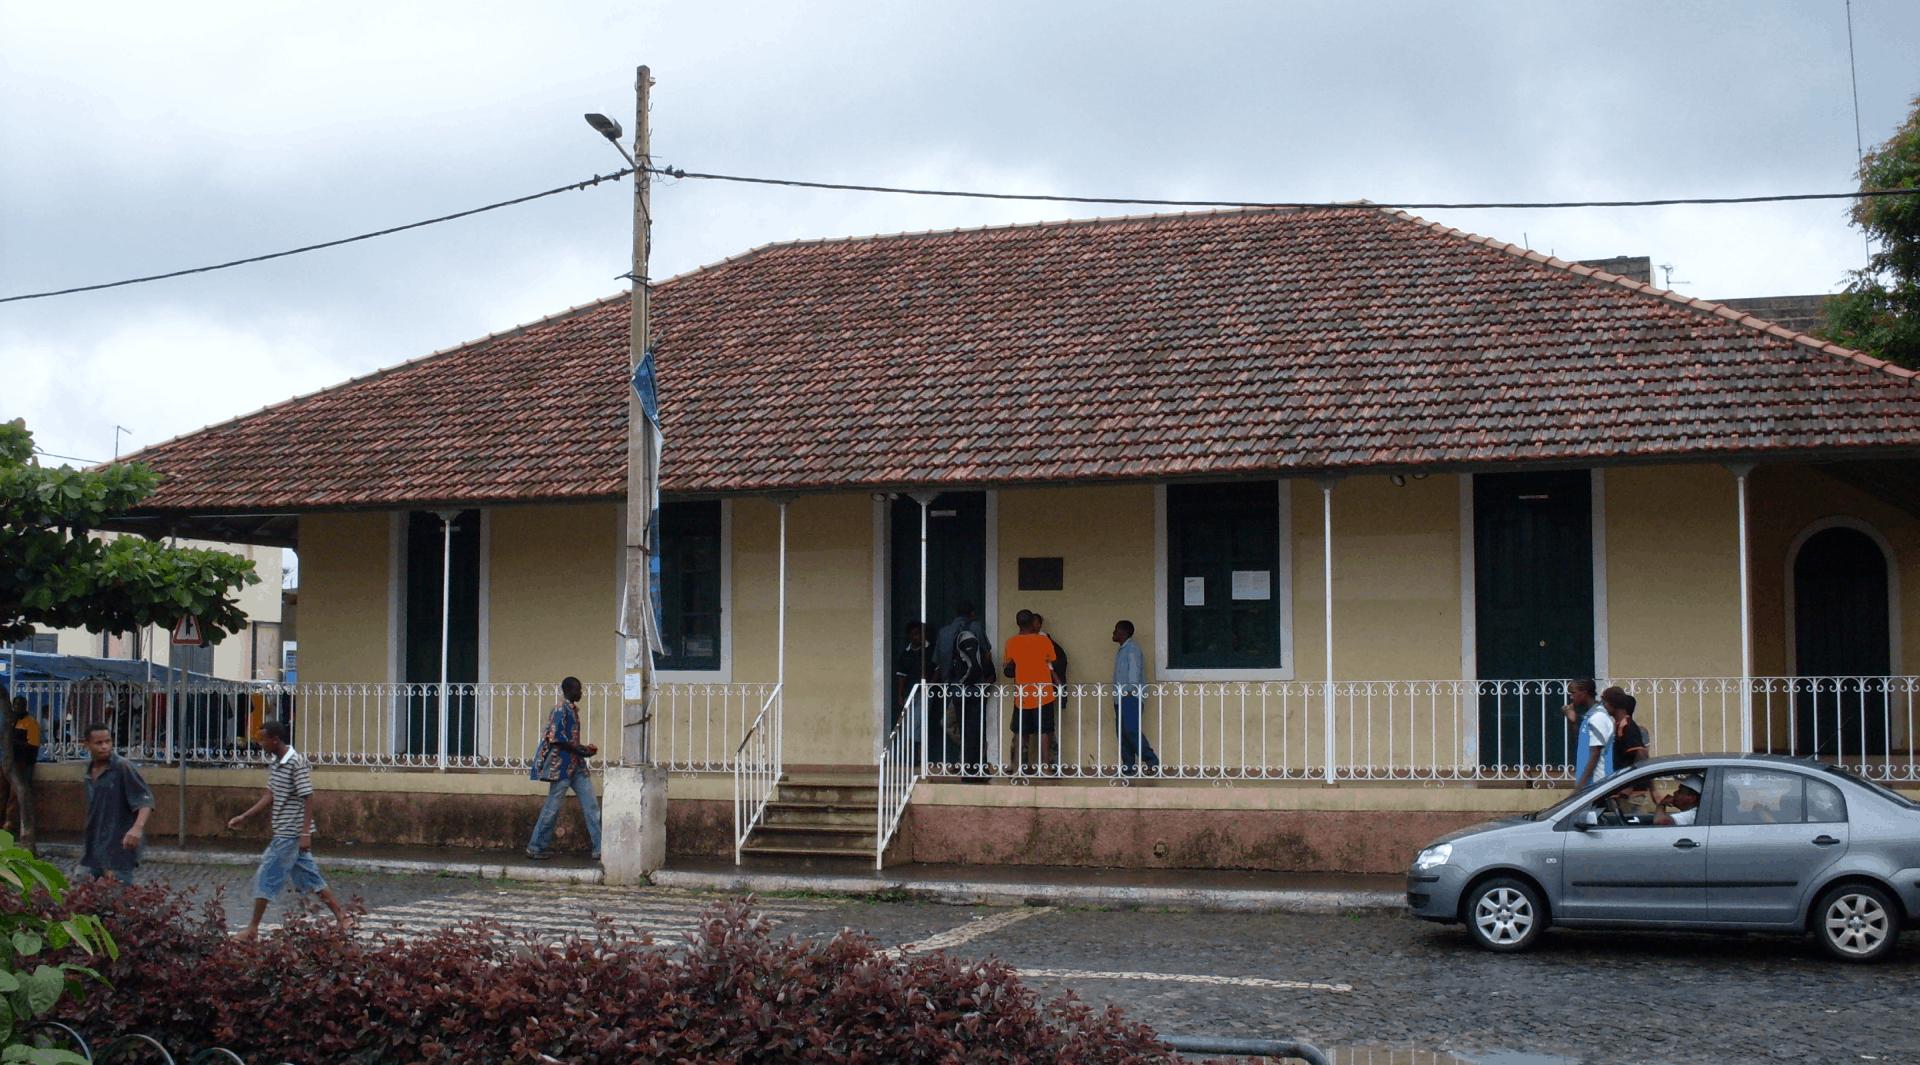 Museu da Tabanca